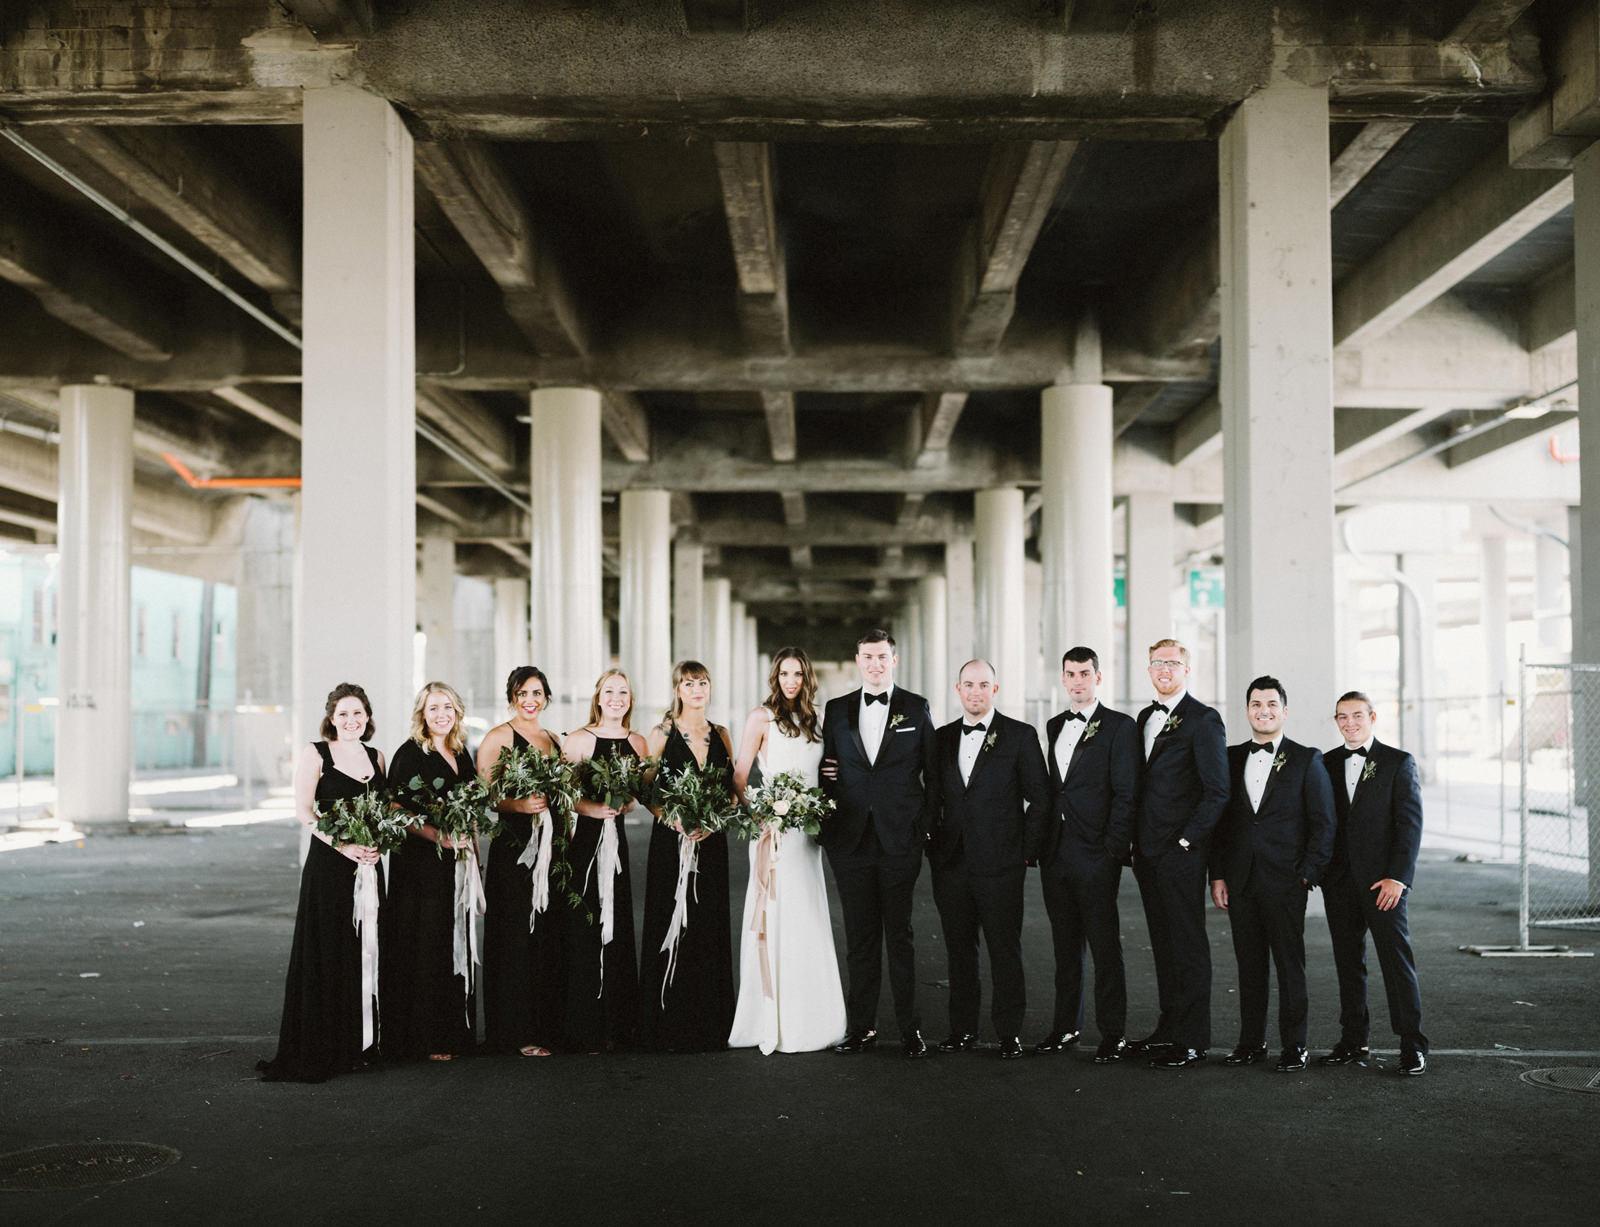 sodo-park-wedding-019 SODO PARK WEDDING